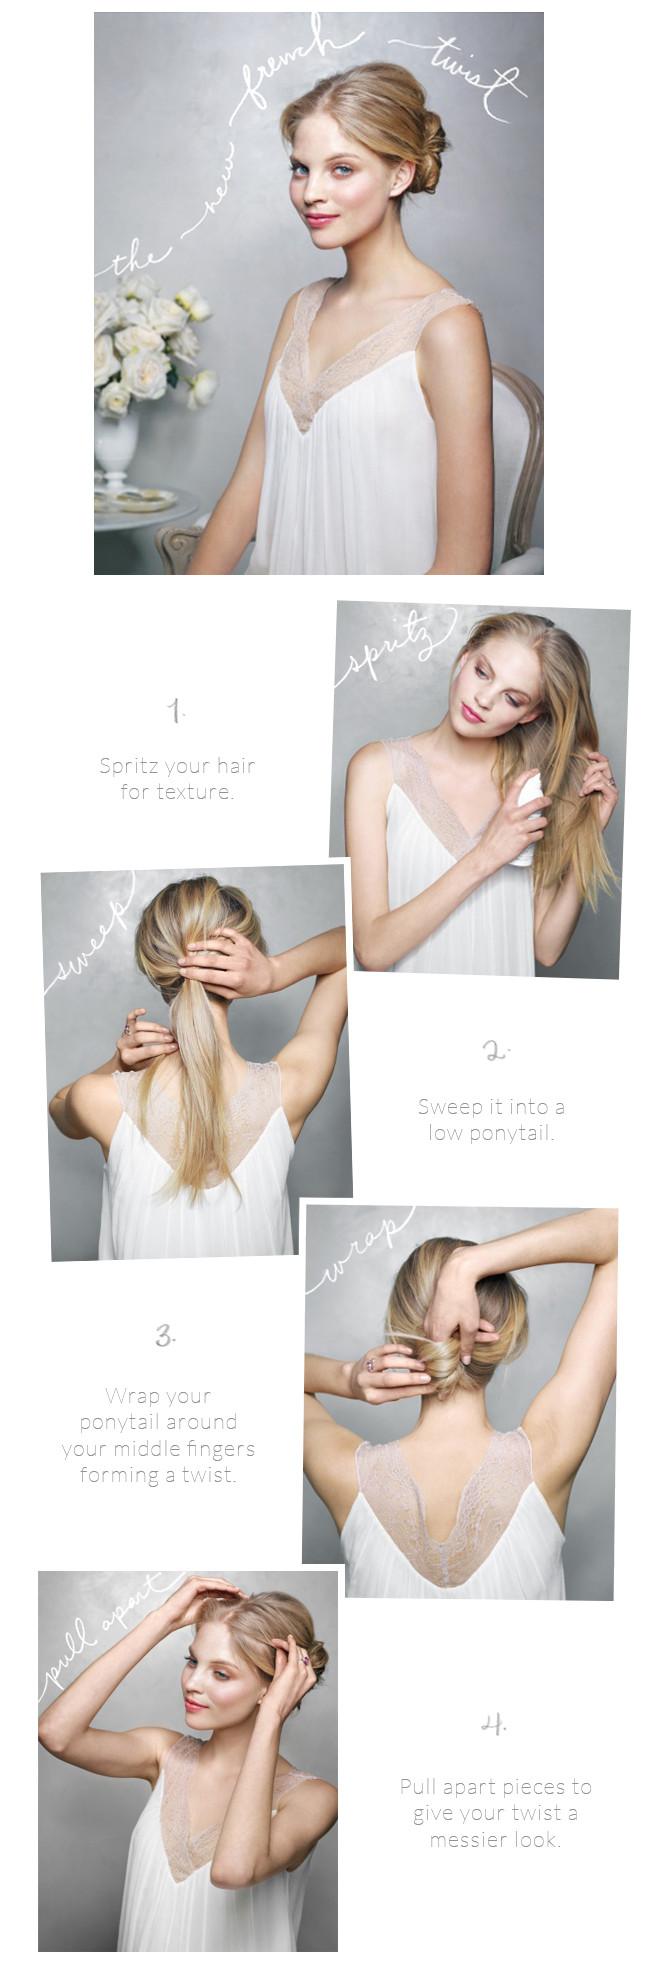 DIY Bridal Hair  The New French Twist Wedding Hairstyles Tutorial ce Wed